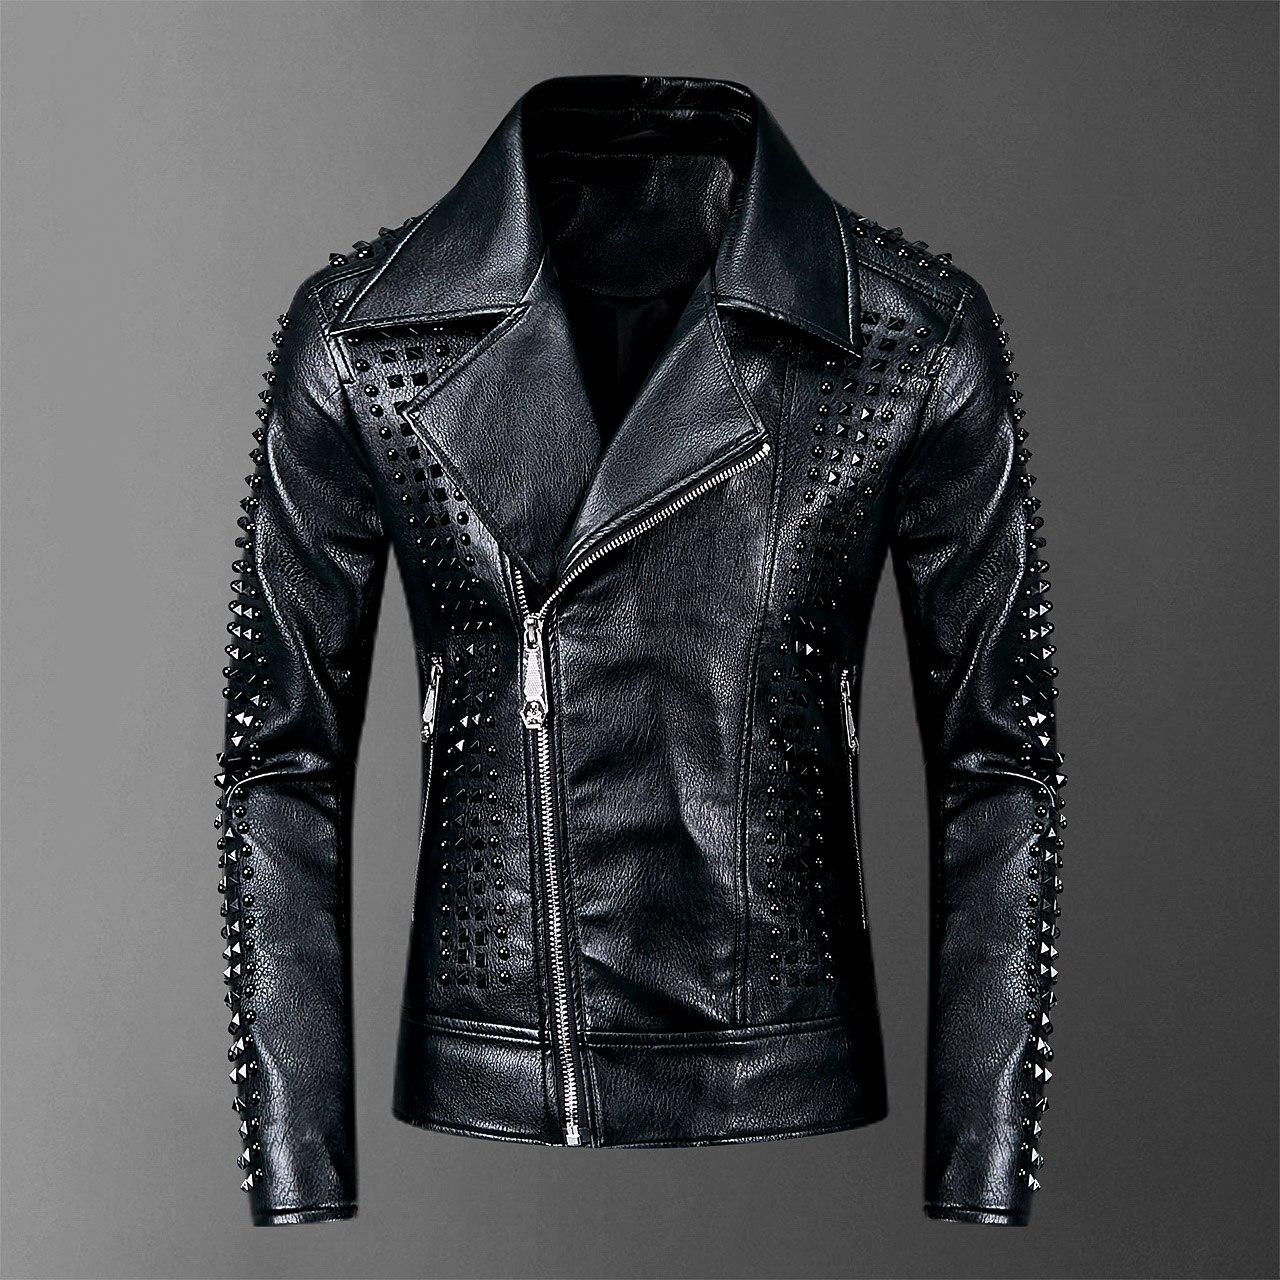 2019 Rivets PU Jackets Men Black Slim Turn-down Neck Zipper Full Streetwear Motorcycle Faux Leather Coats Casacas Para Hombre